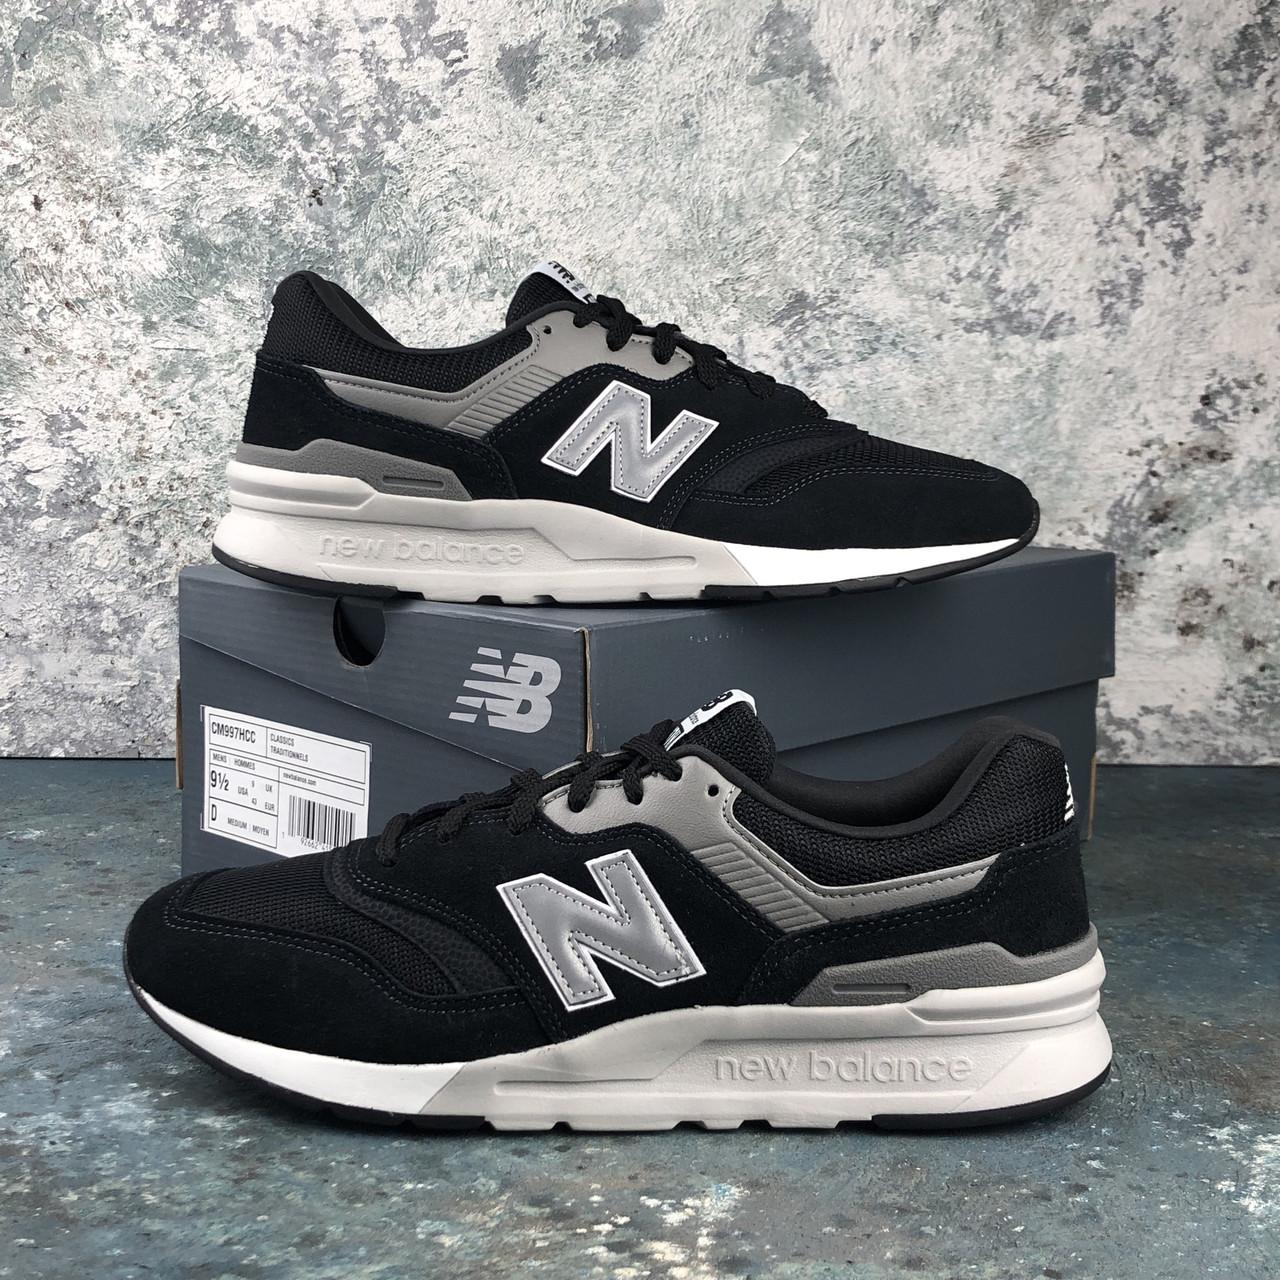 Мужские кроссовки New Balance 997 H Black\Silver CM997HCC. Оригинал. Замша. Подошва резина